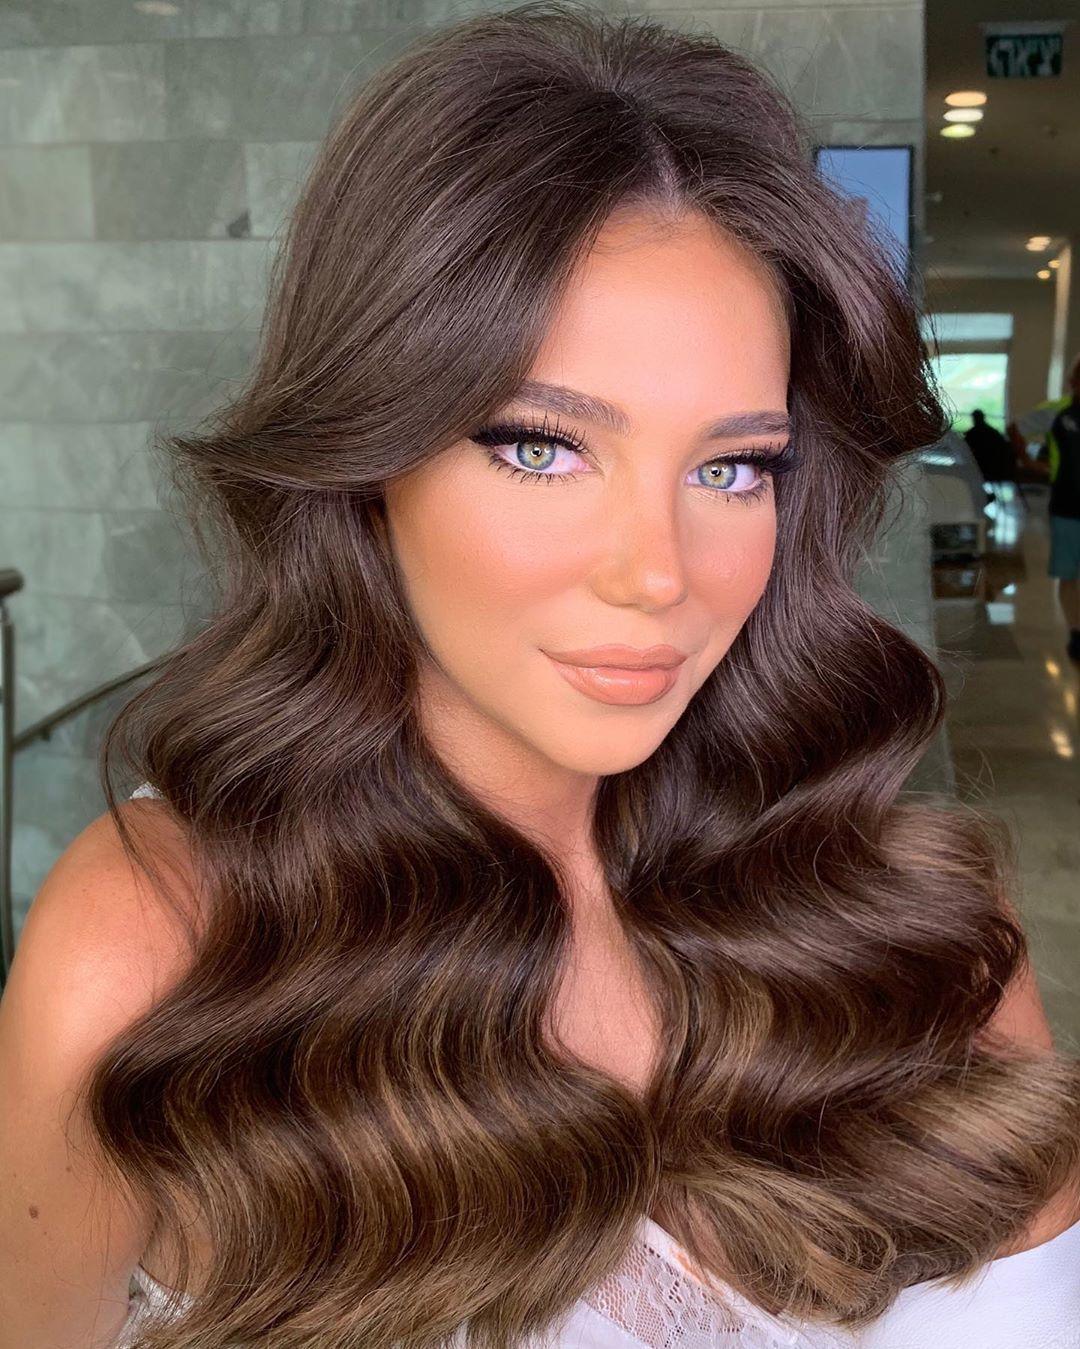 "Photo of Rachel Uzan 》Makeup Artist on Instagram: ""#mybeautifulbride PAZ ✨💫✨ #makeupartist @racheluzan 💄 #hairstyle @dvir_tvik _  Gleam and glow by @diormakeup  #eyeshadow…"""